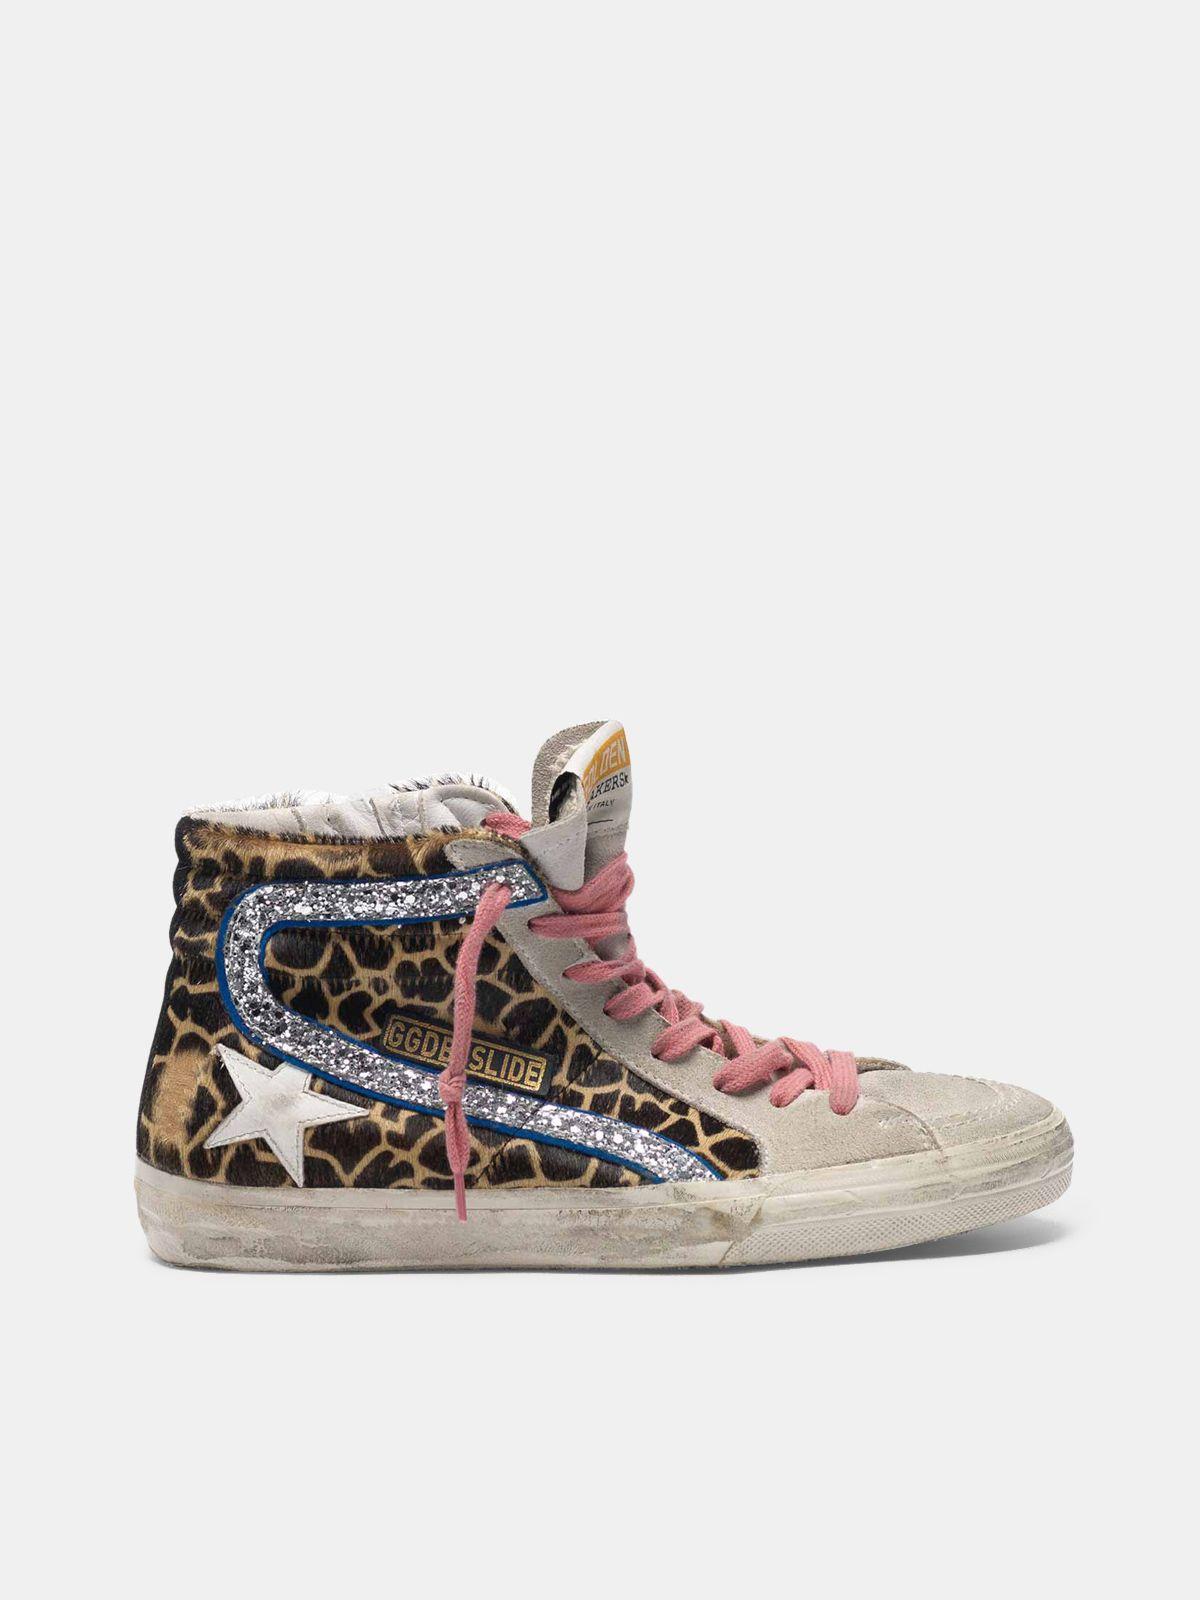 Golden Goose - Slide sneakers in leopard-print pony skin in